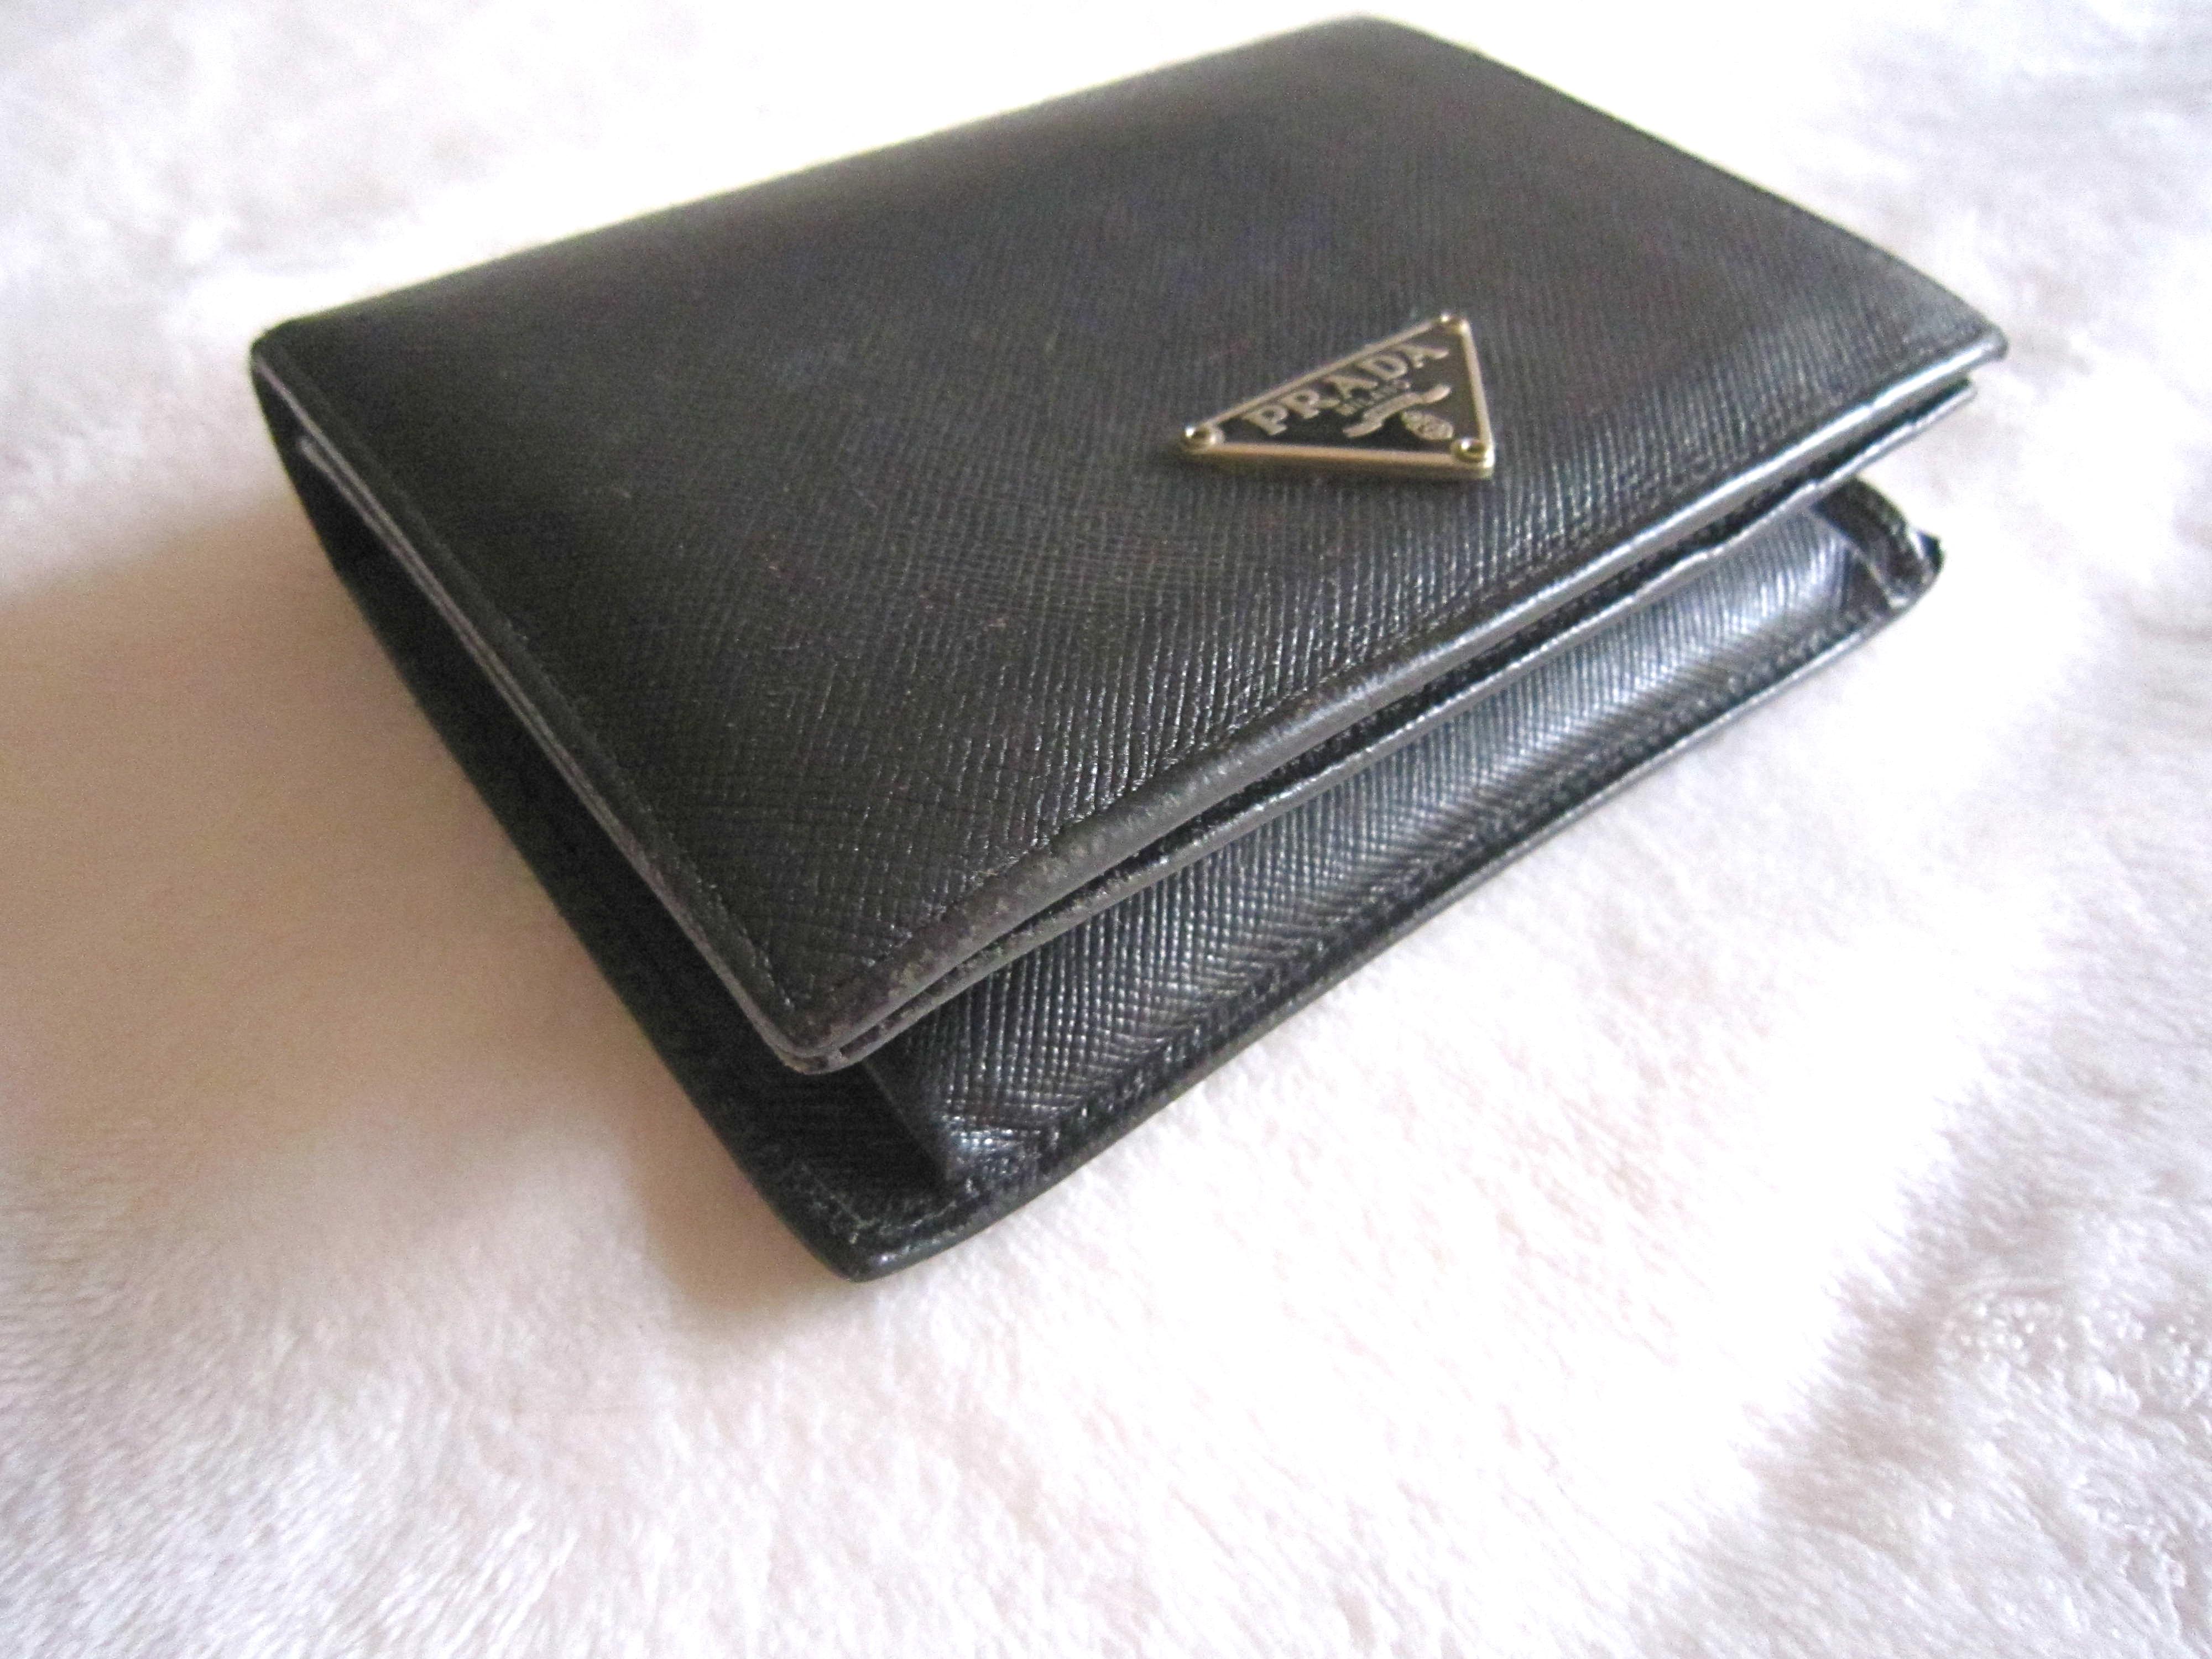 eed3d3d5b94591 Prada Black Saffiano Leather Bi-Fold Wallet - Luxurylana Boutique